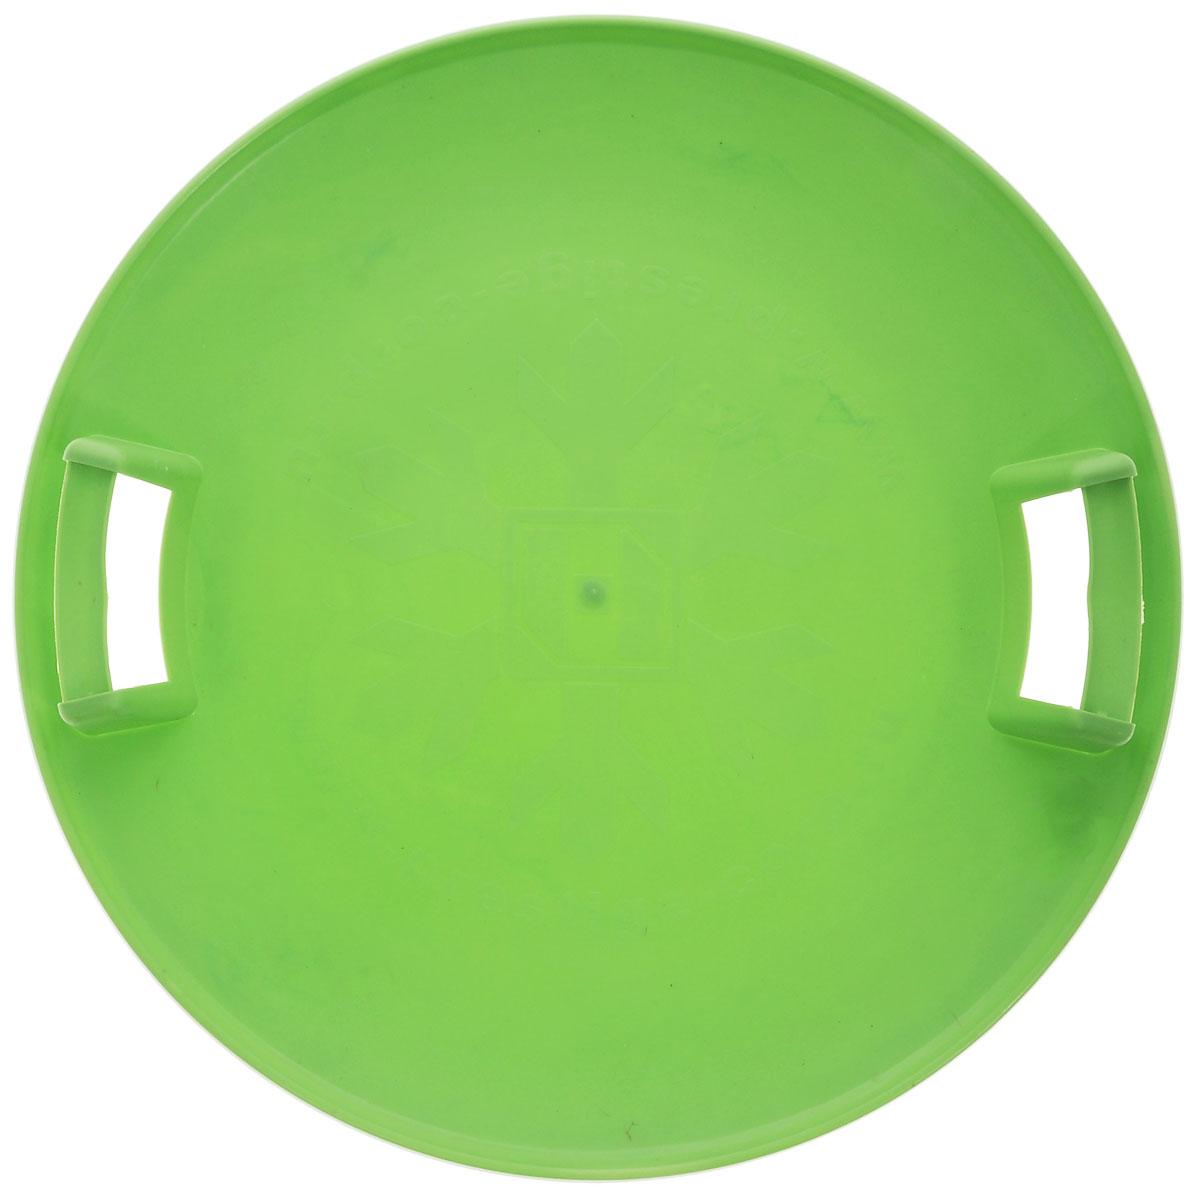 "Престиж Санки-ледянки ""Экстрим"", с ручками, цвет: зеленый, диаметр 580 мм"